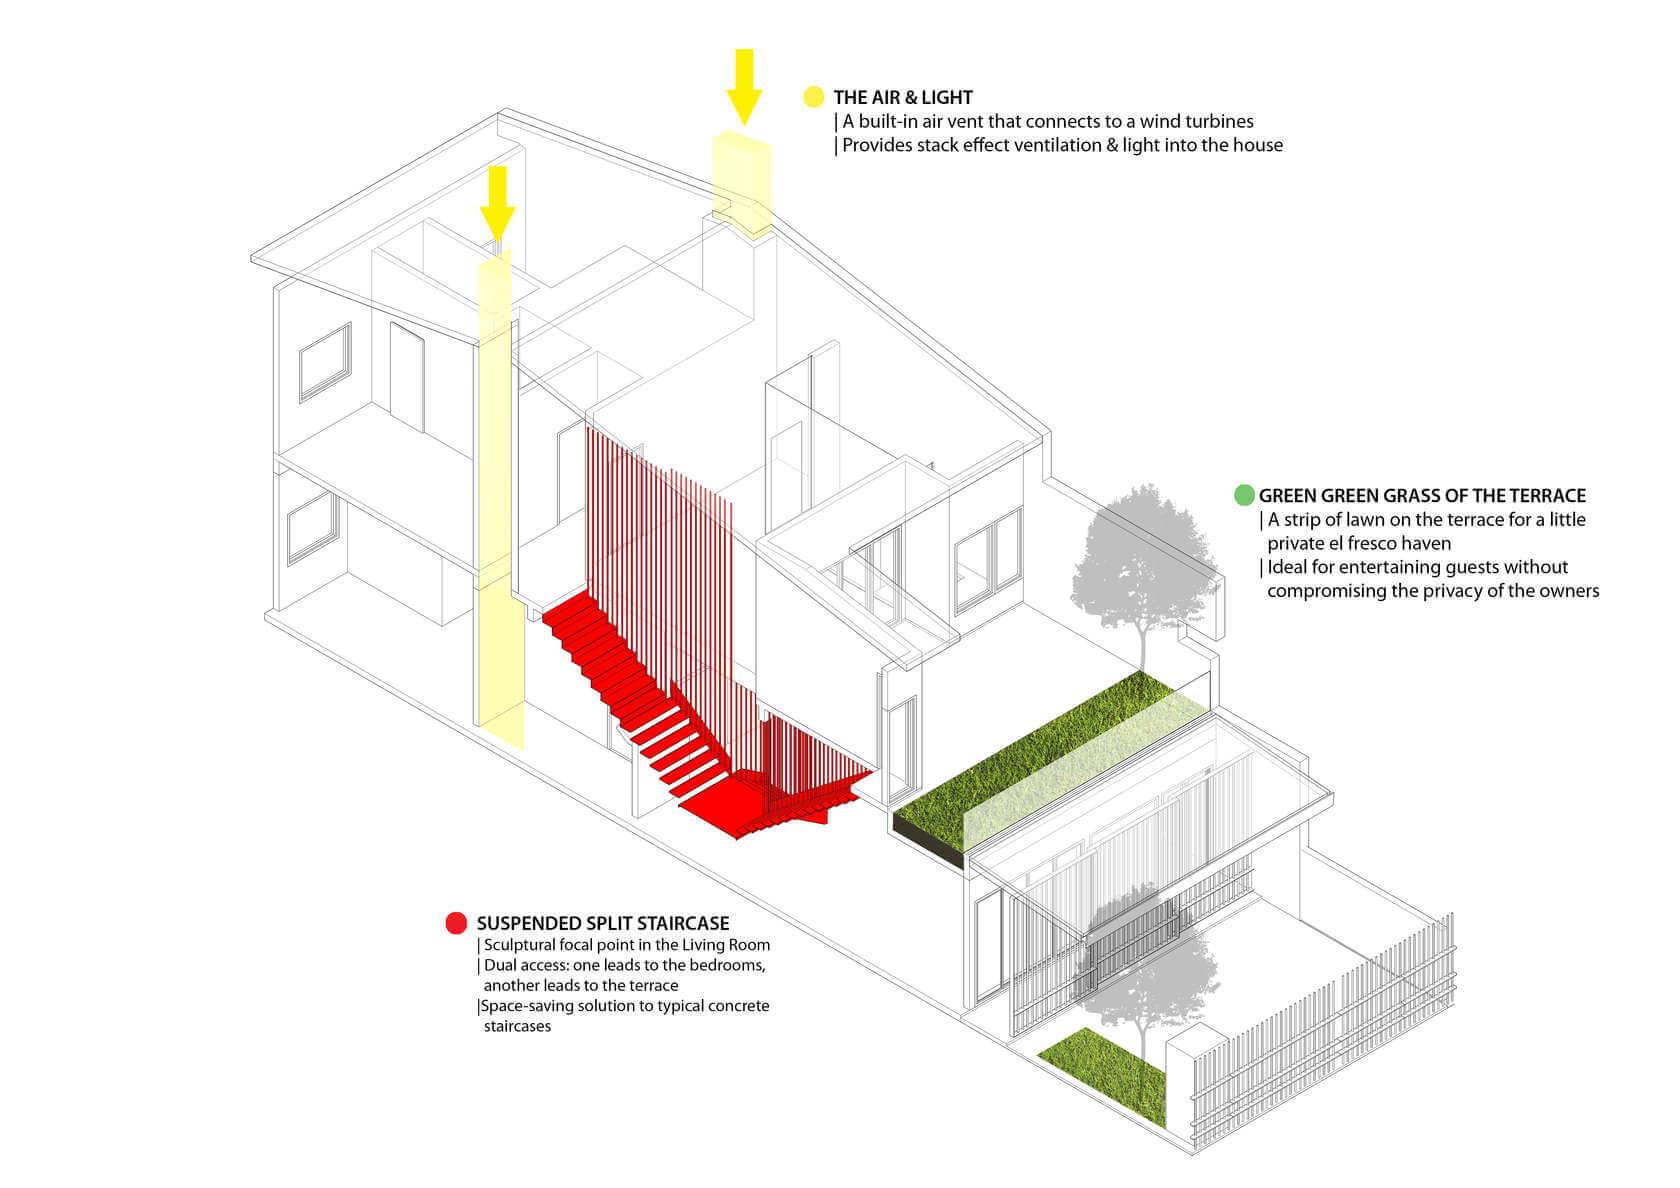 kuala-lumpur-home-drtan-lm-architect-14